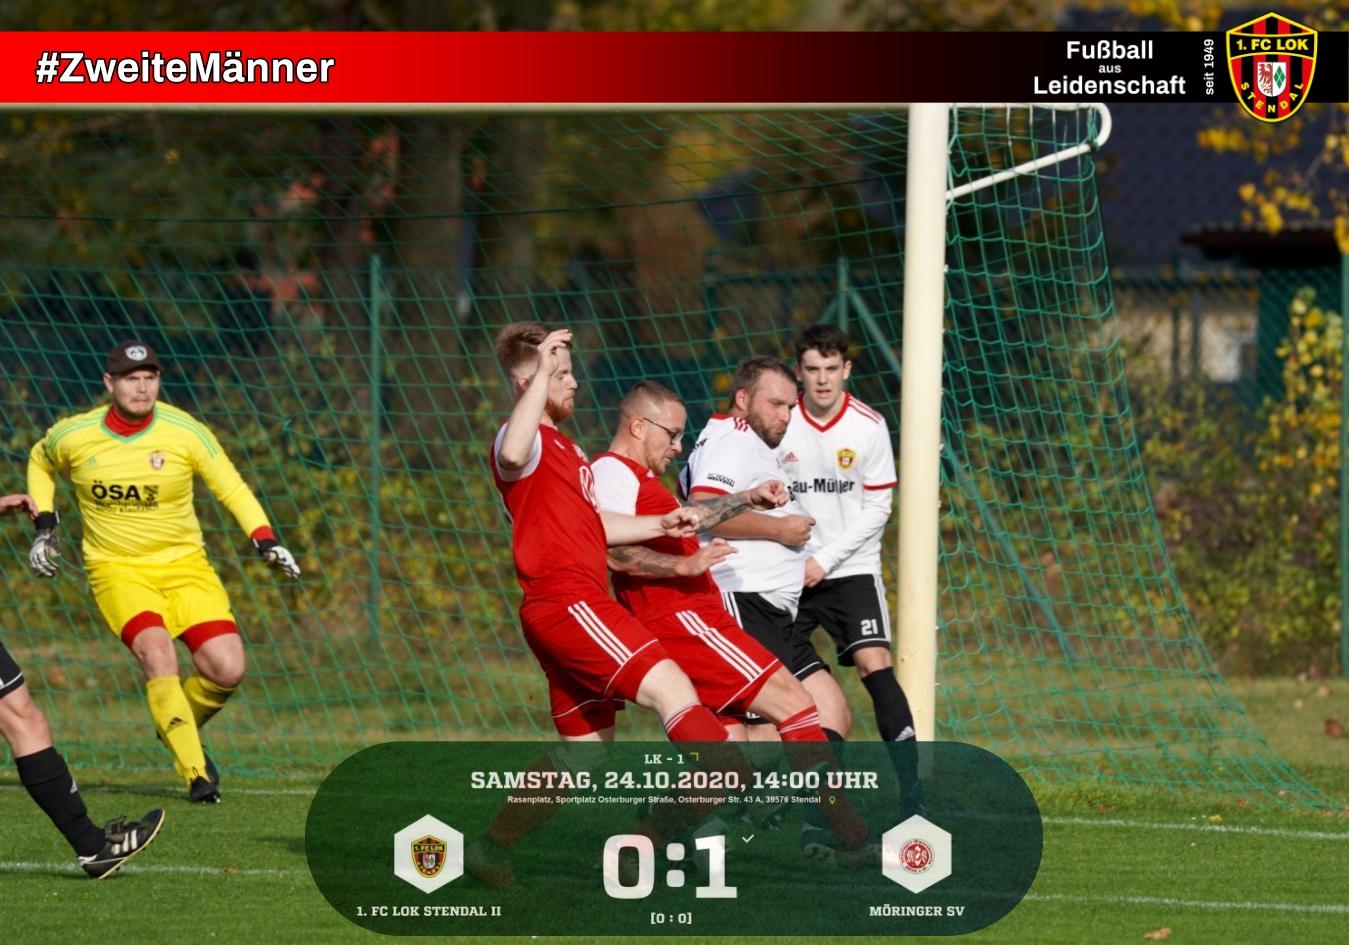 Landesklasse 1 ► 8. Spieltag - 1. FC Lok Stendal